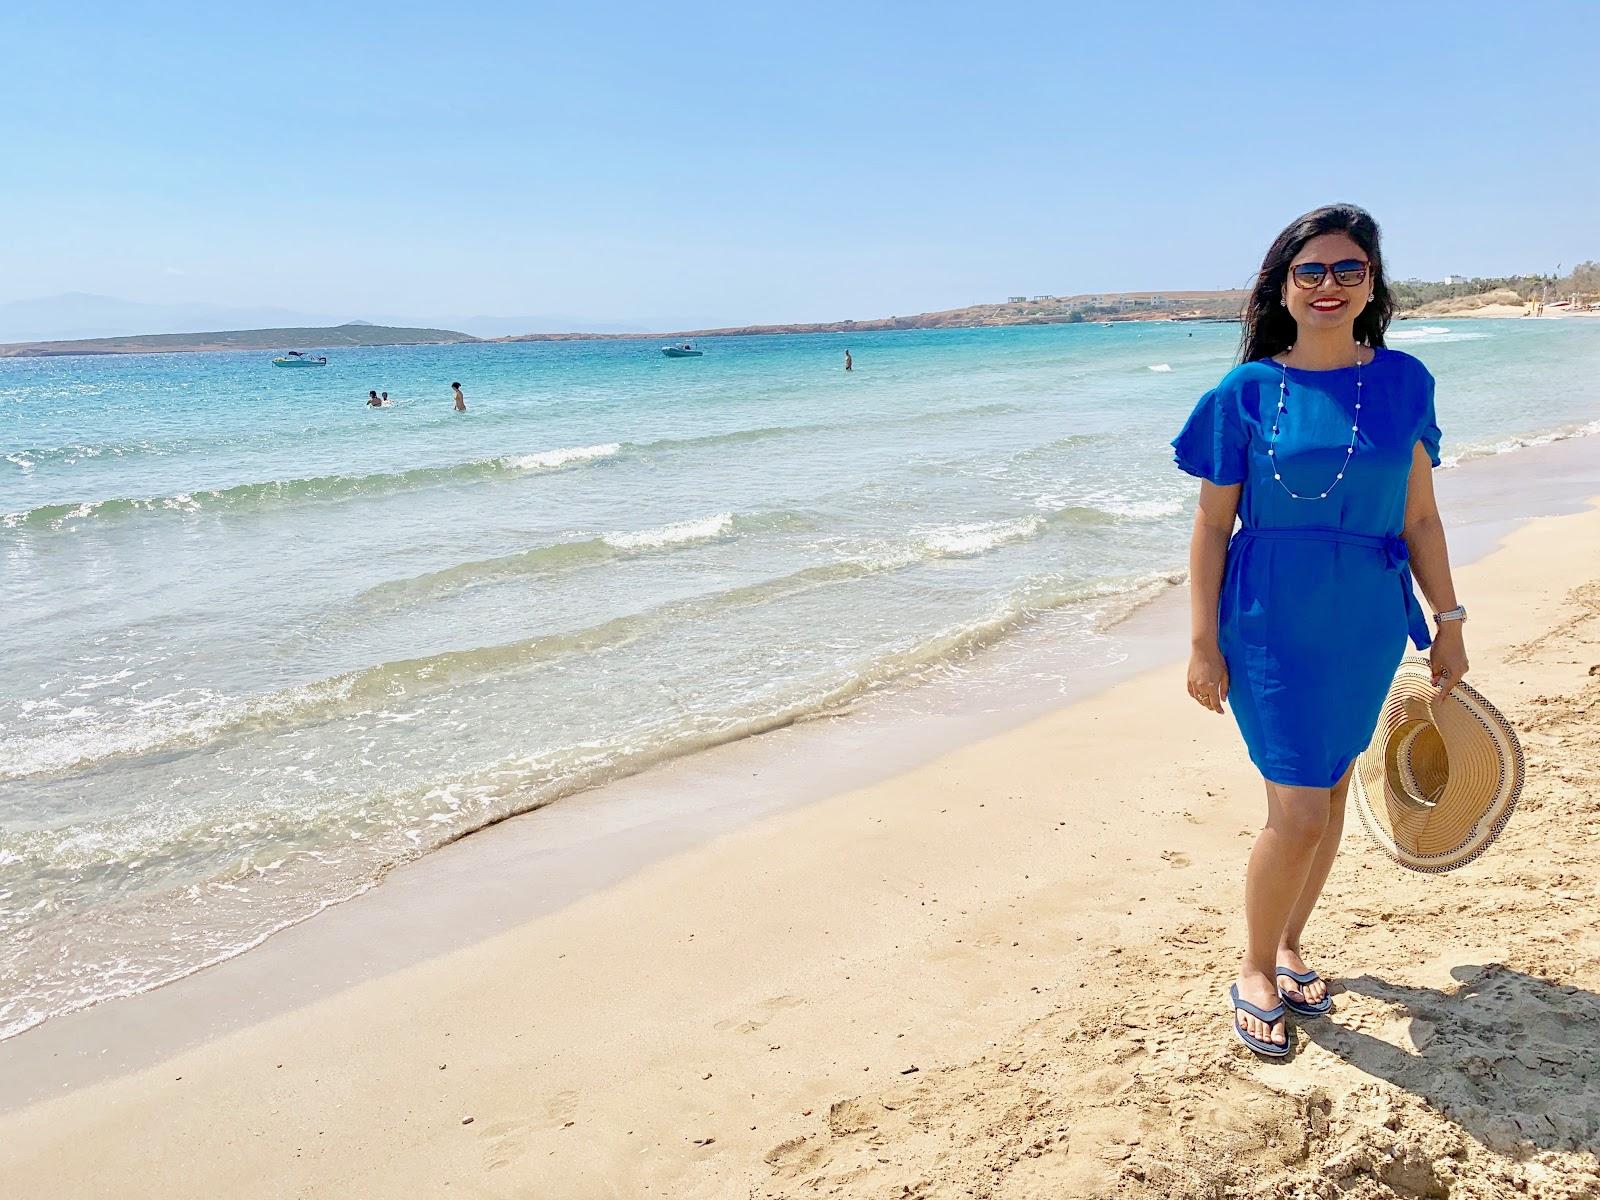 Santa Maria beach Paros - Best beaches in Paros. How to visit Paros. 2 days in Paros